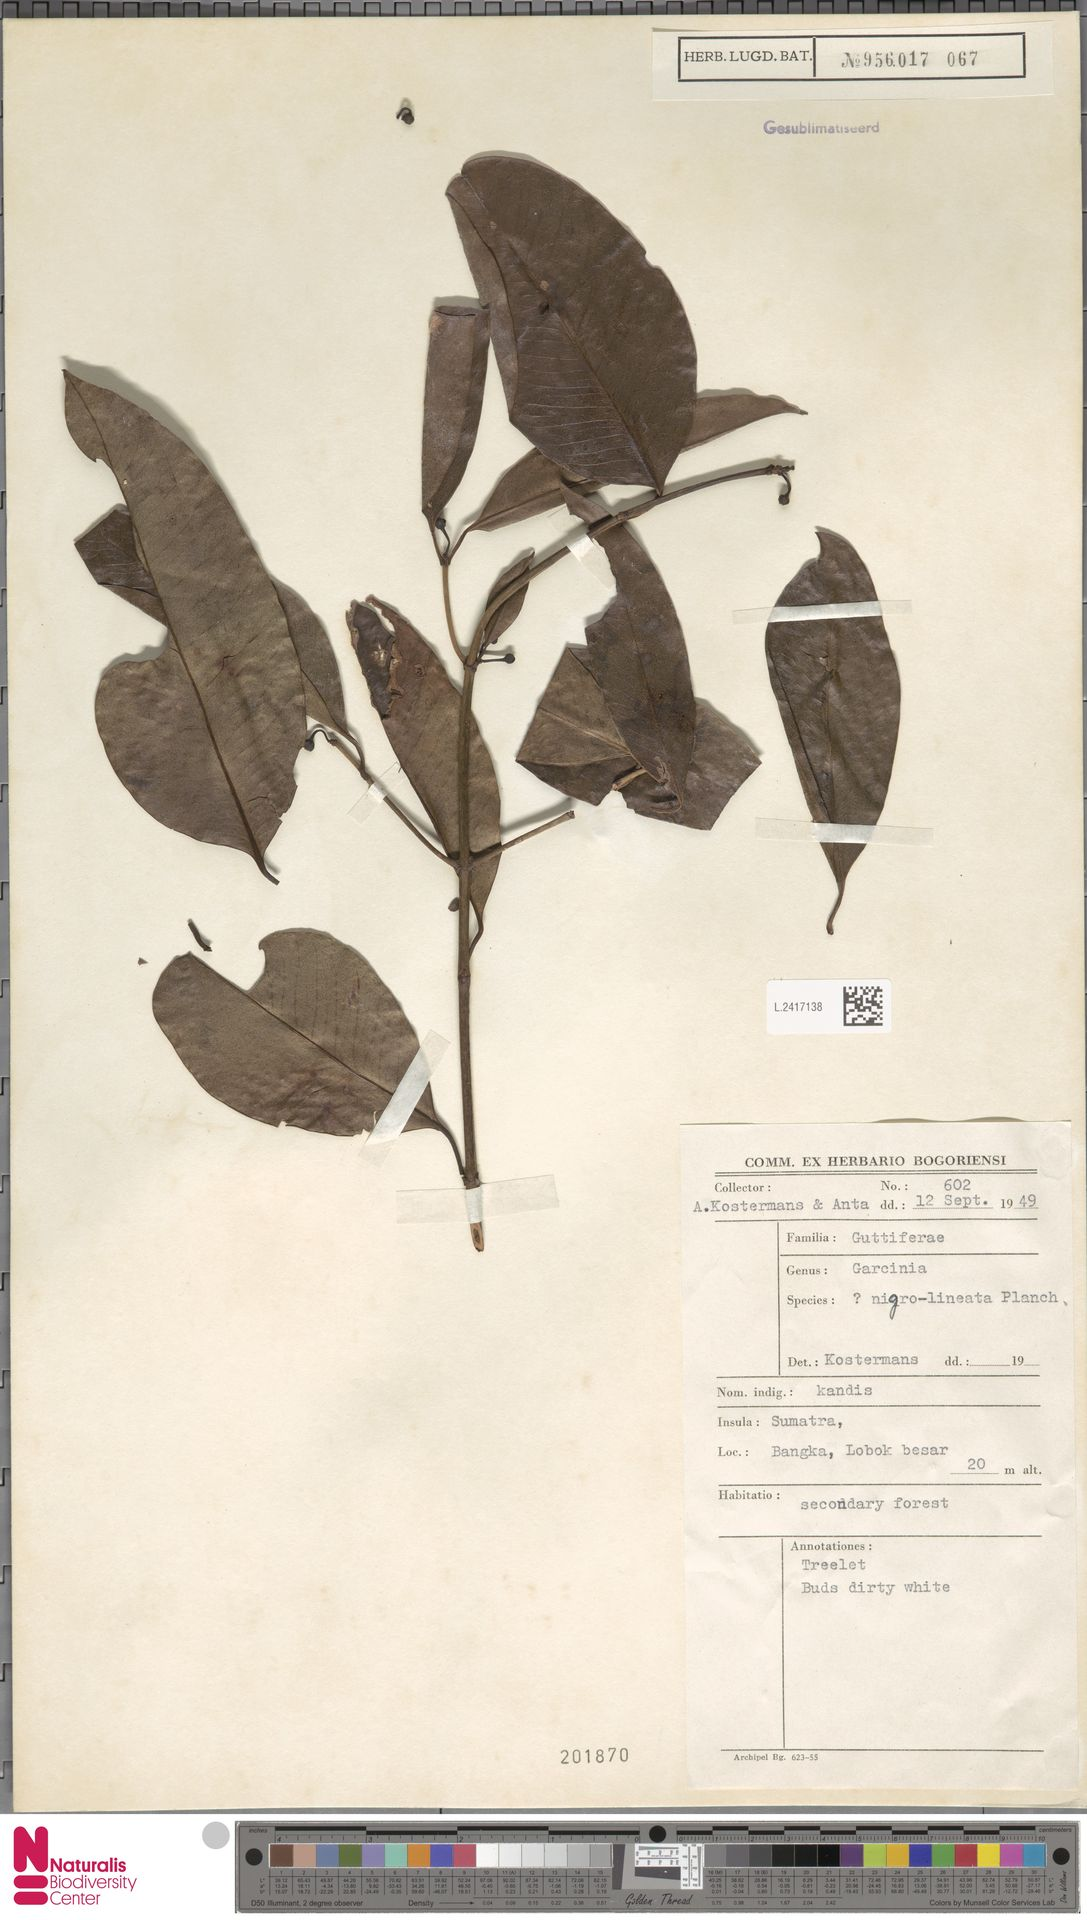 L.2417138 | Garcinia nigrolineata Planch. ex T.Anderson